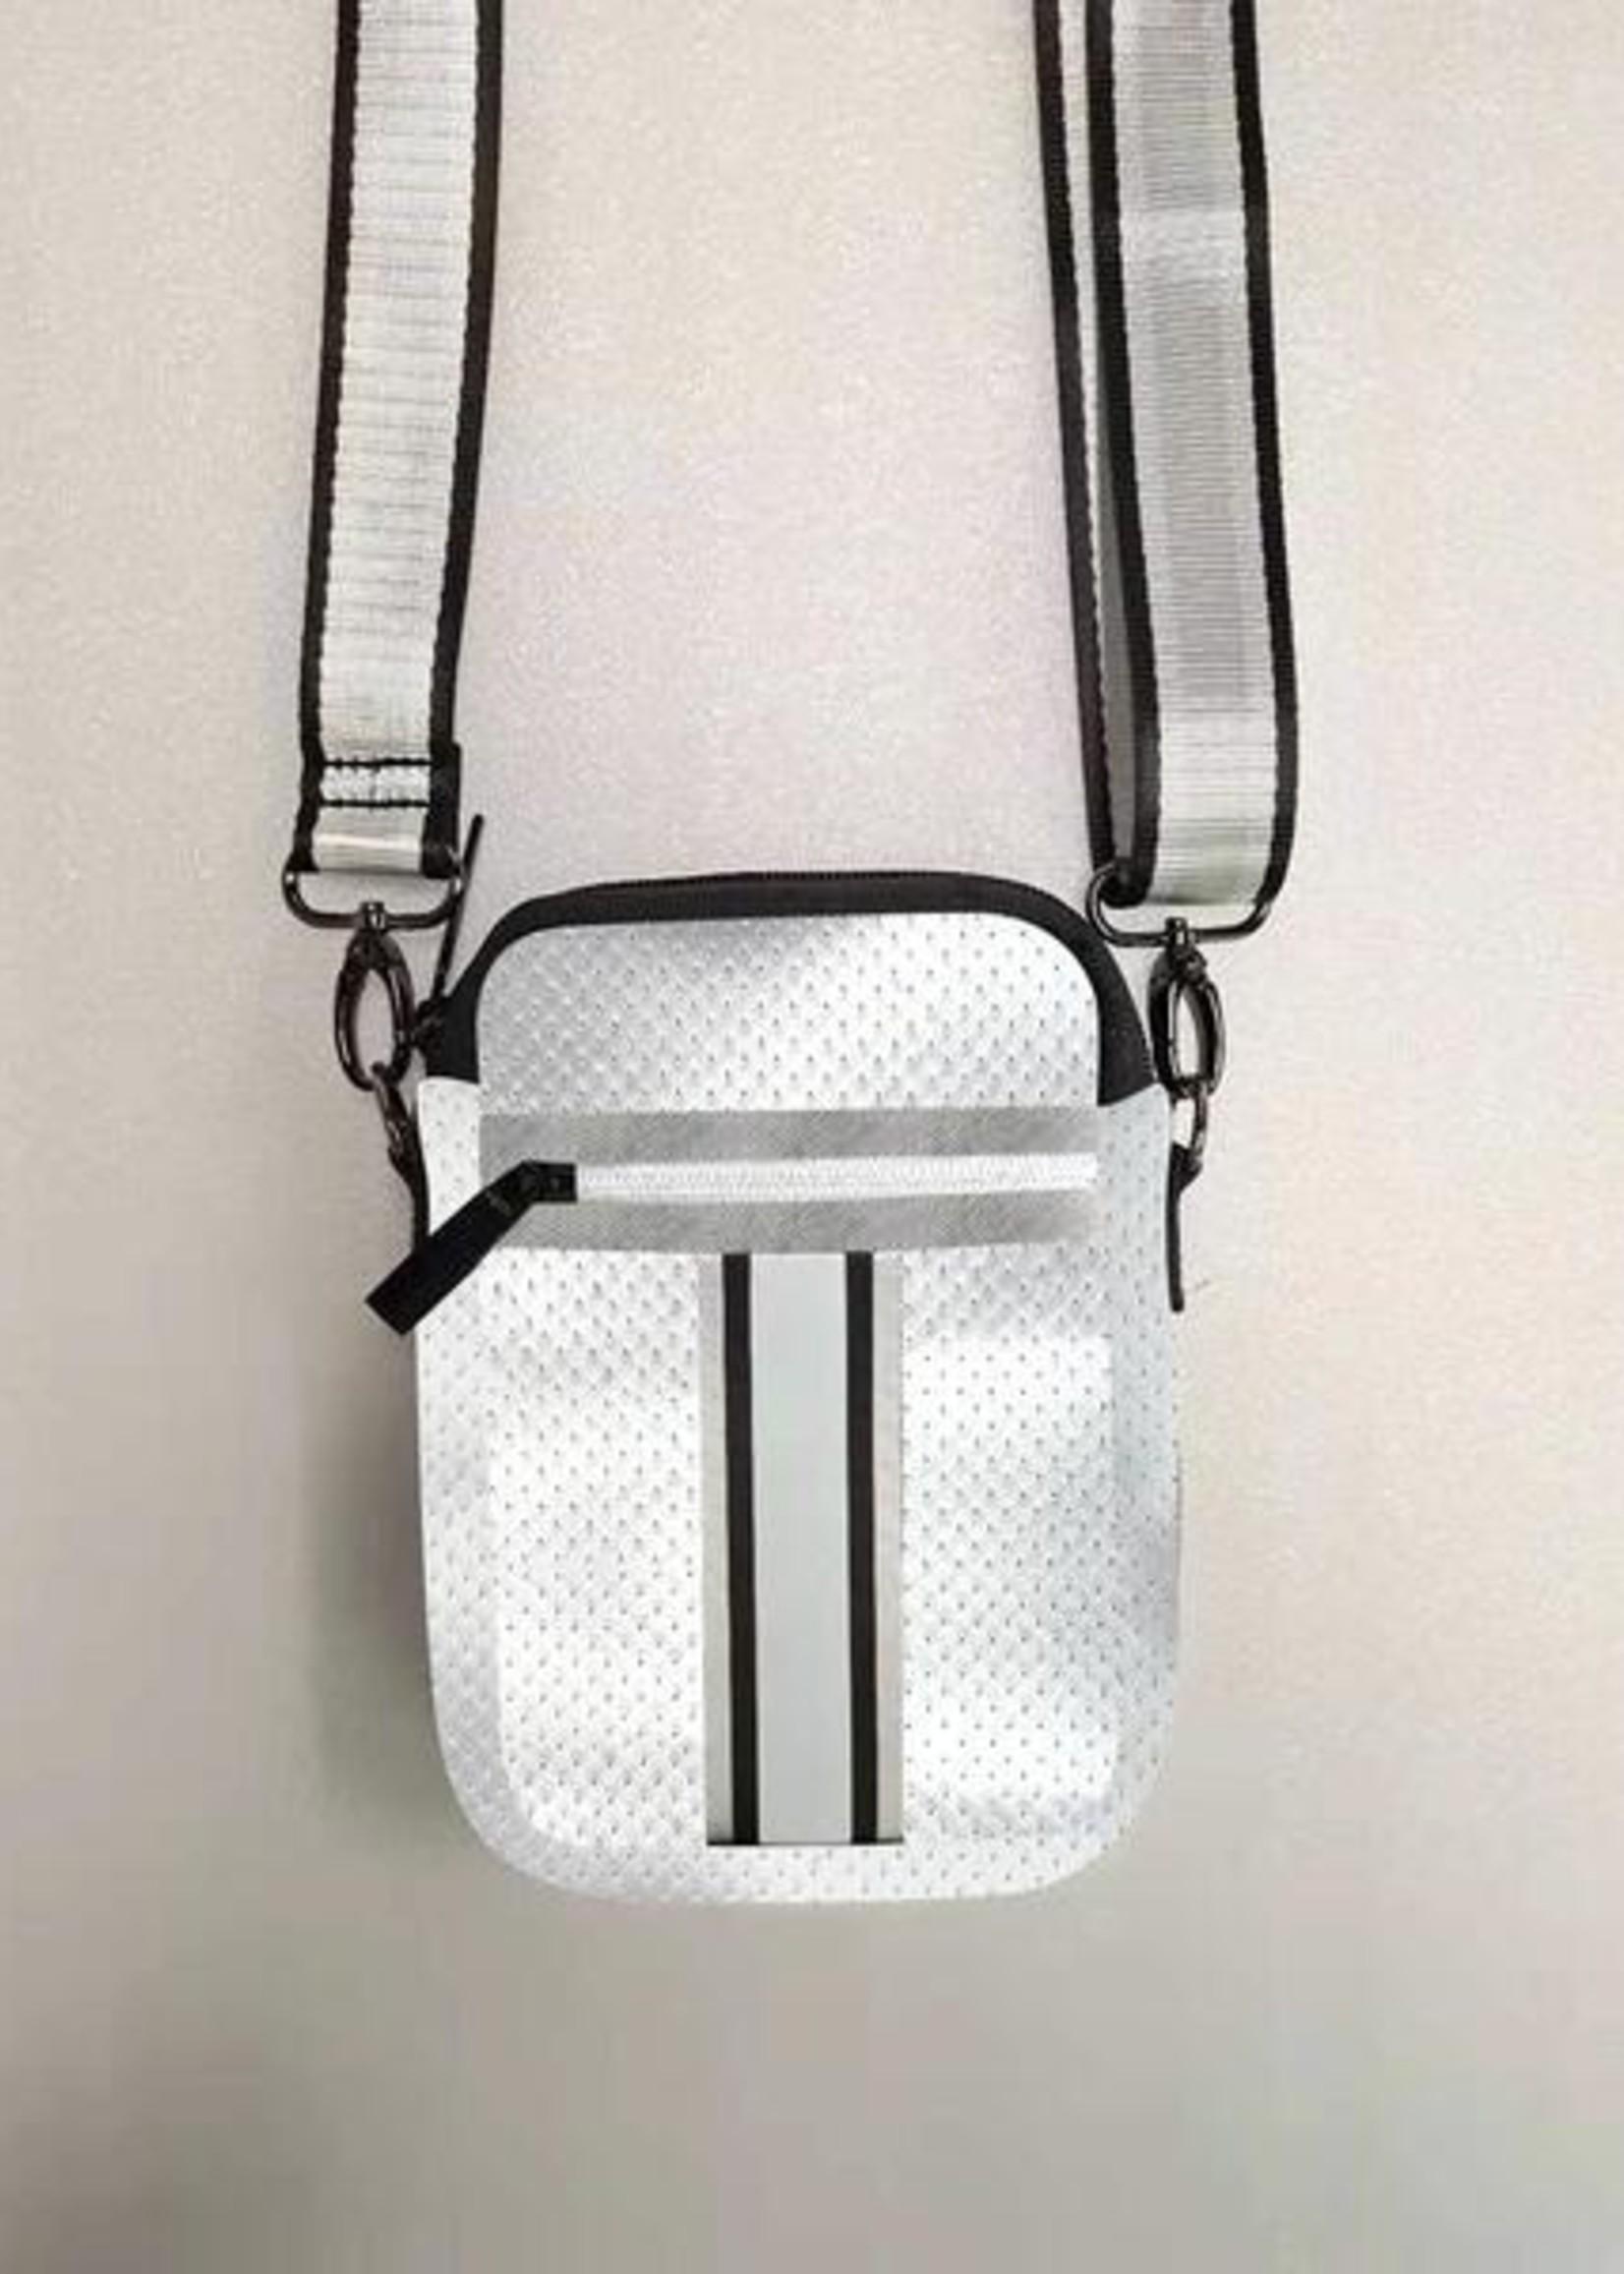 Casey ice phone bag